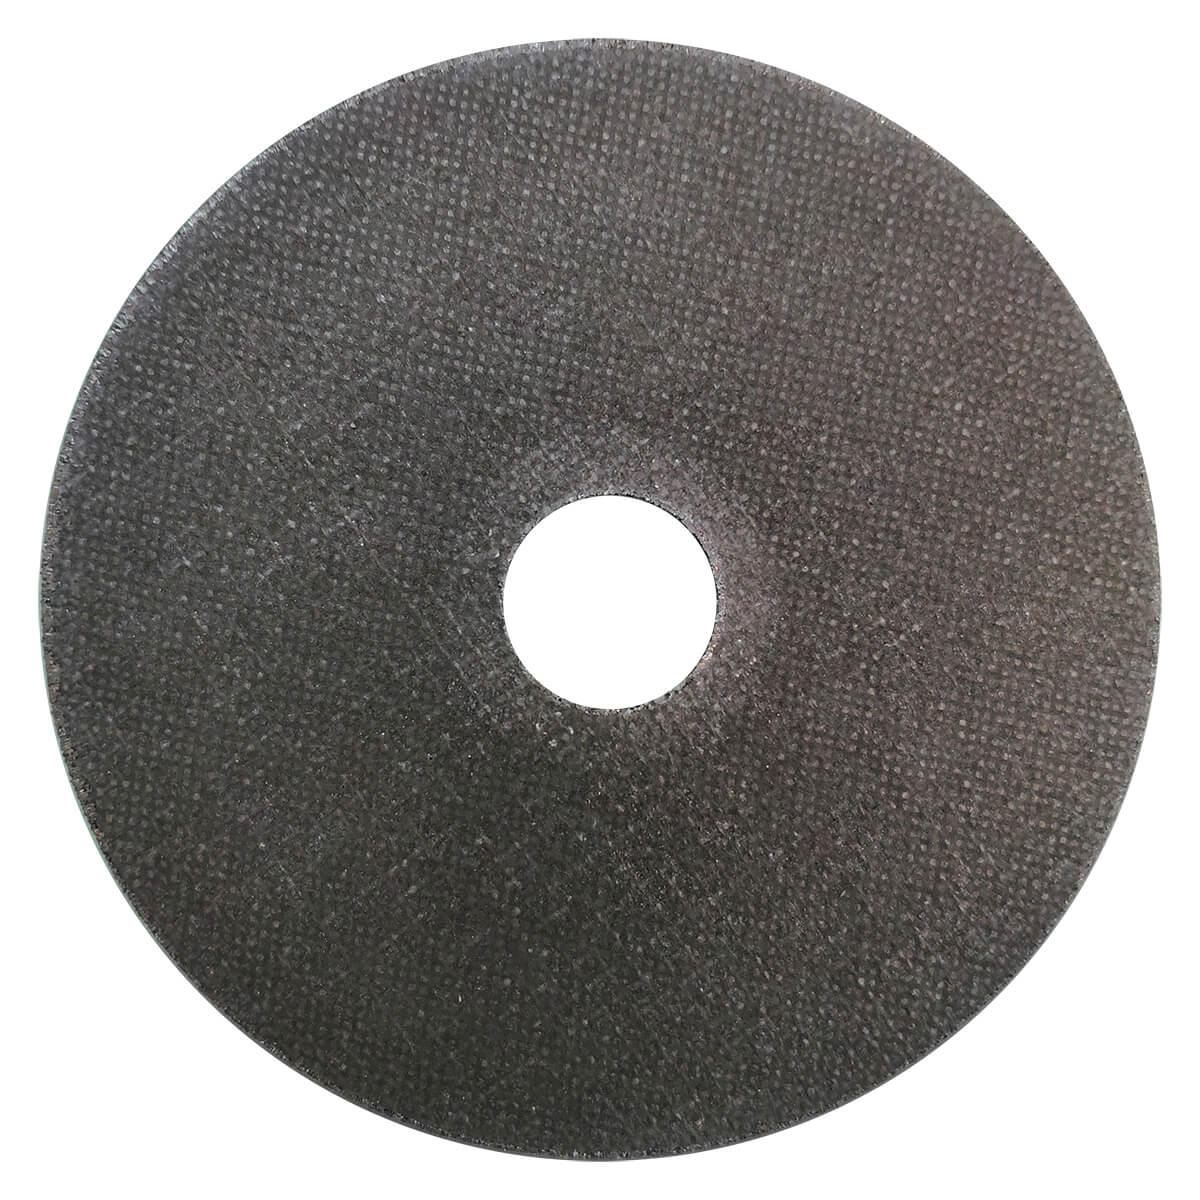 Disco de Corte Fino para Metal 115x1x22mm - Refoc